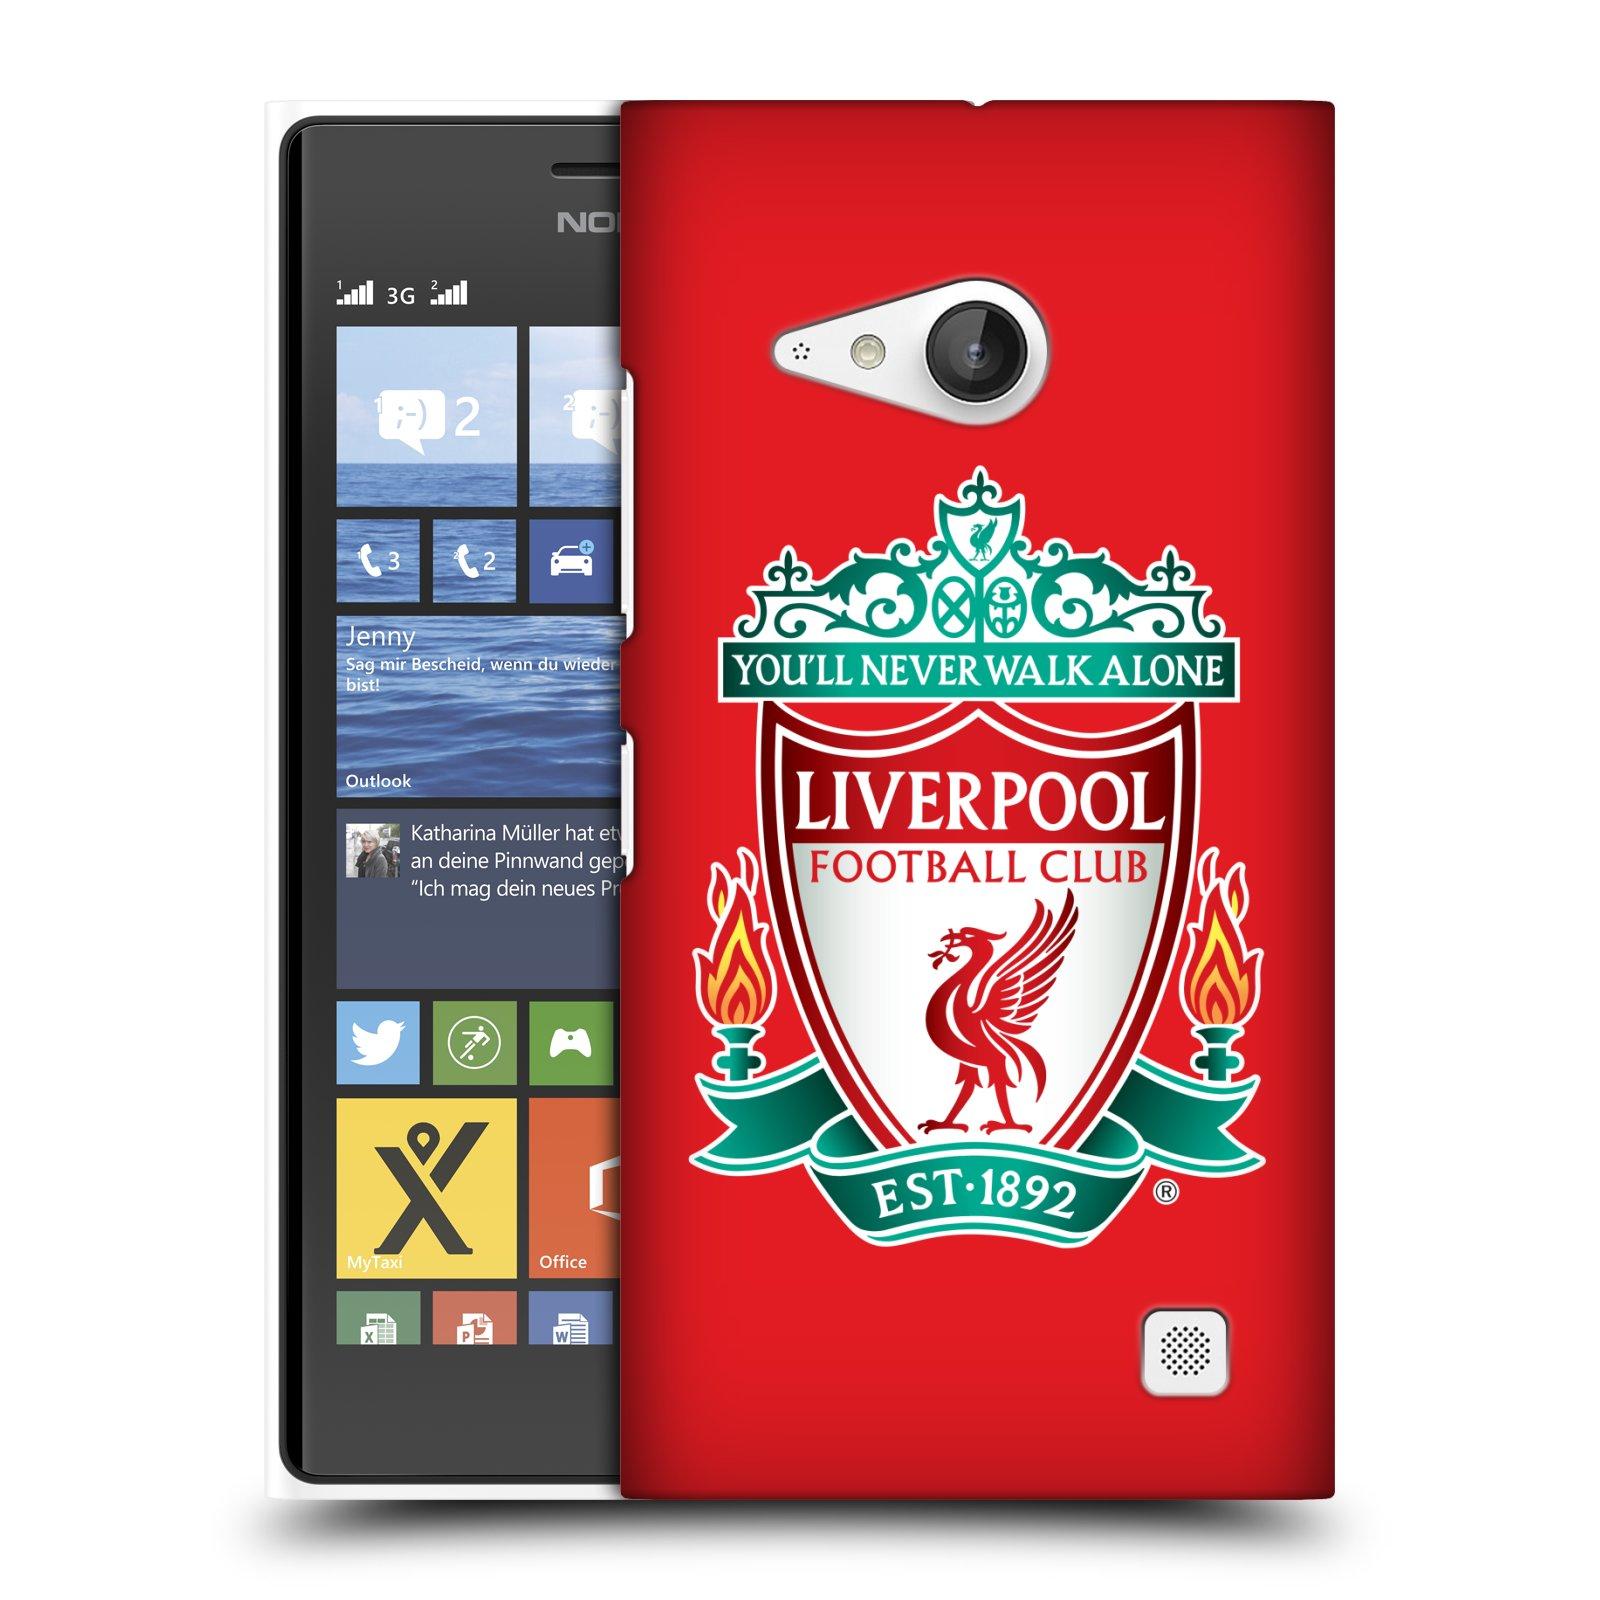 Plastové pouzdro na mobil Nokia Lumia 735 HEAD CASE ZNAK LIVERPOOL FC OFFICIAL RED (Kryt či obal na mobilní telefon Liverpool FC Official pro Nokia Lumia 735)